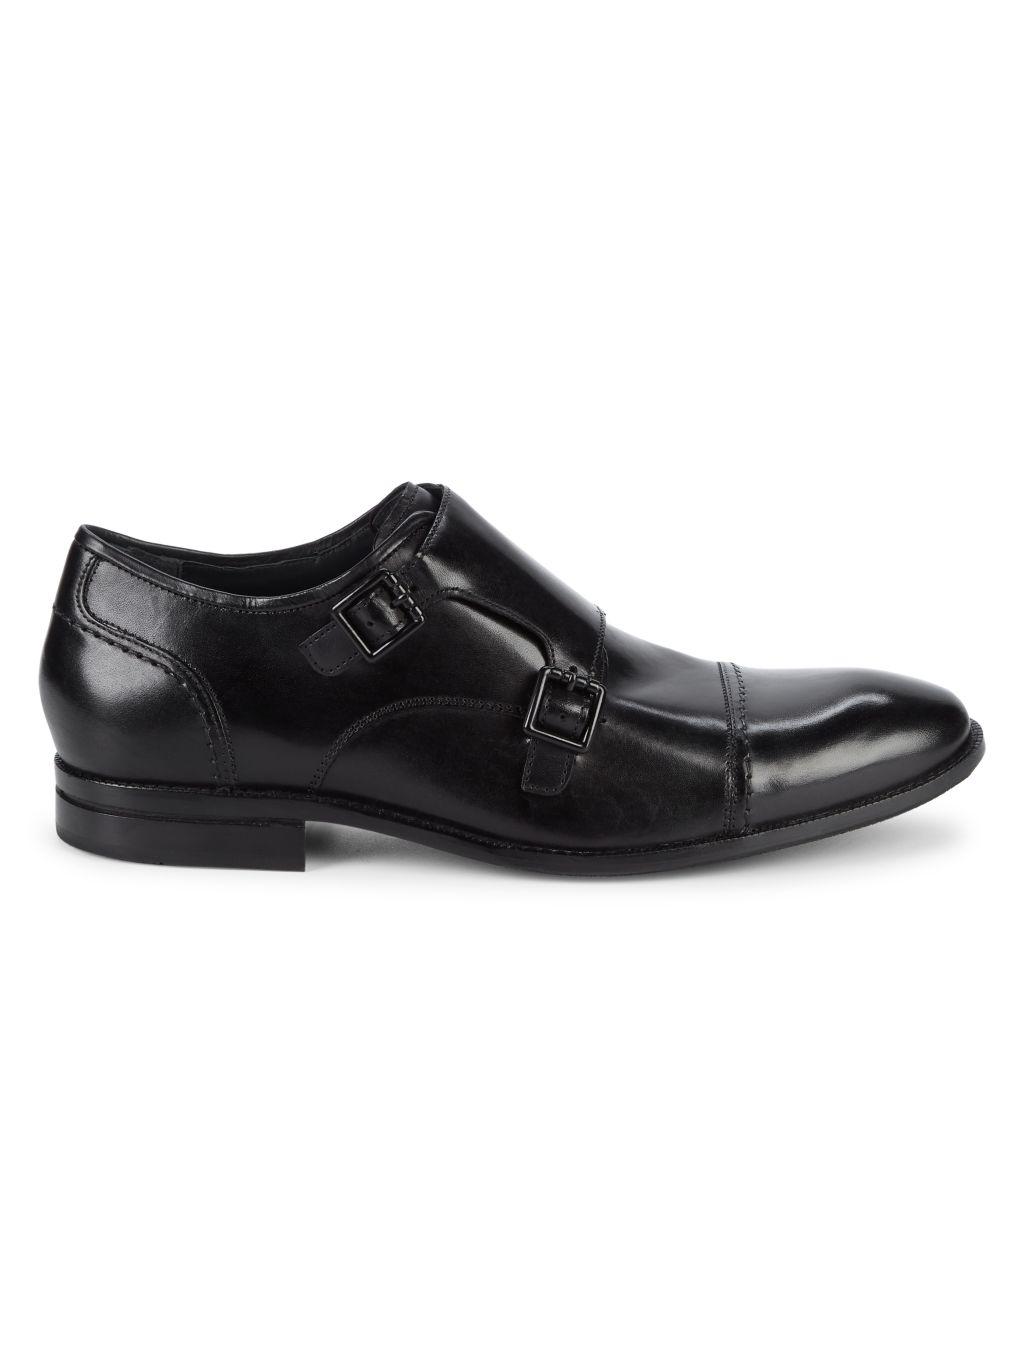 Cole Haan Cap-Toe Leather Oxfords